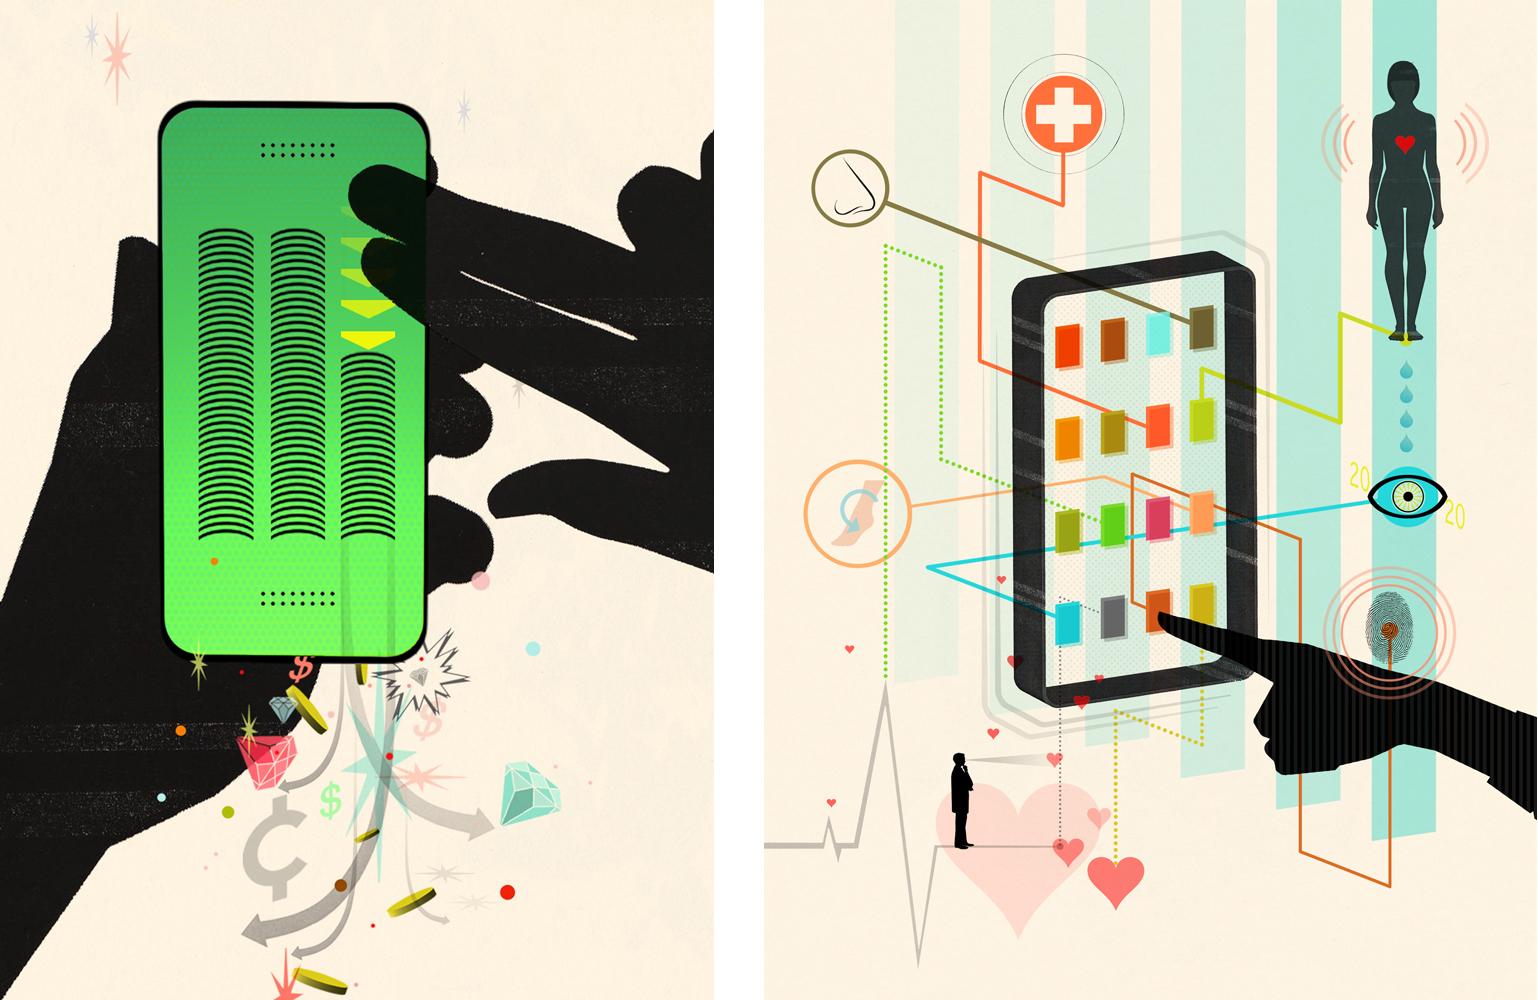 Mark-Allen-Miller-Illustration-8.jpeg